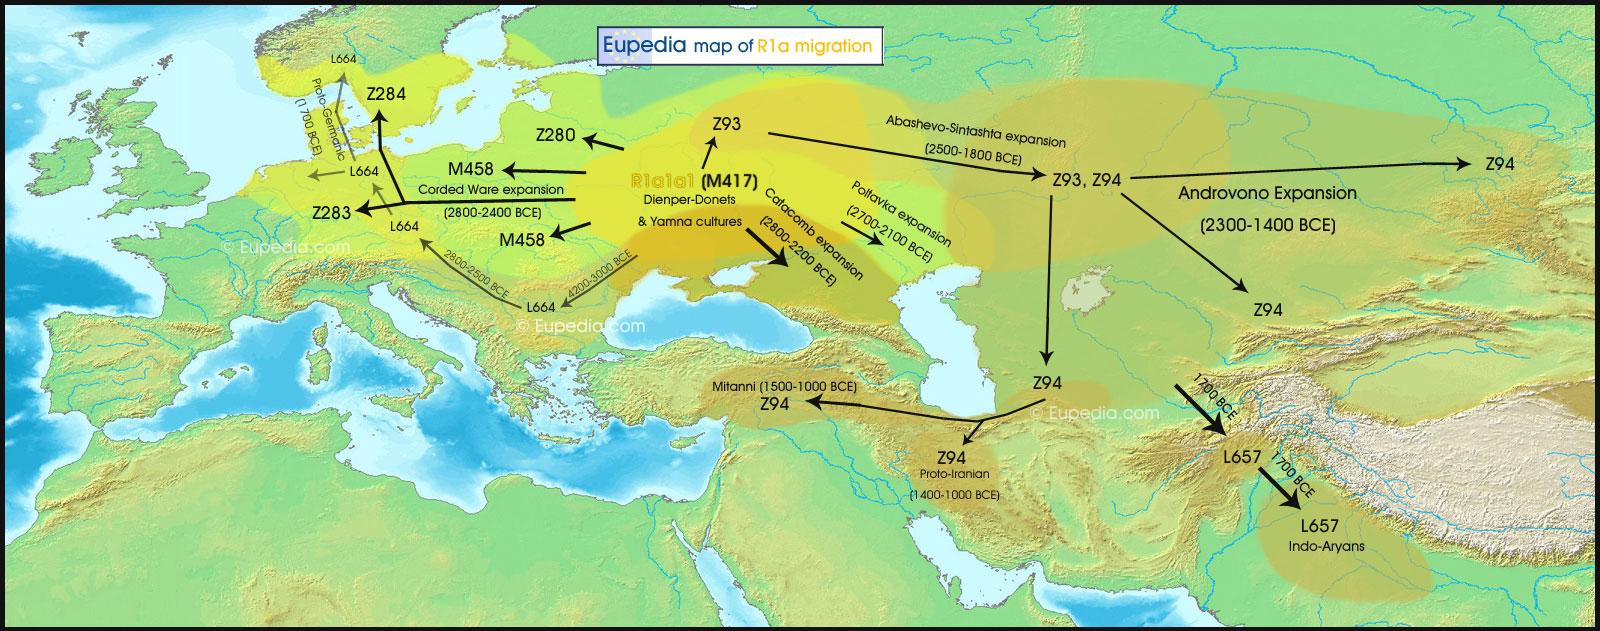 R1a-Wanderung nach Eupedia